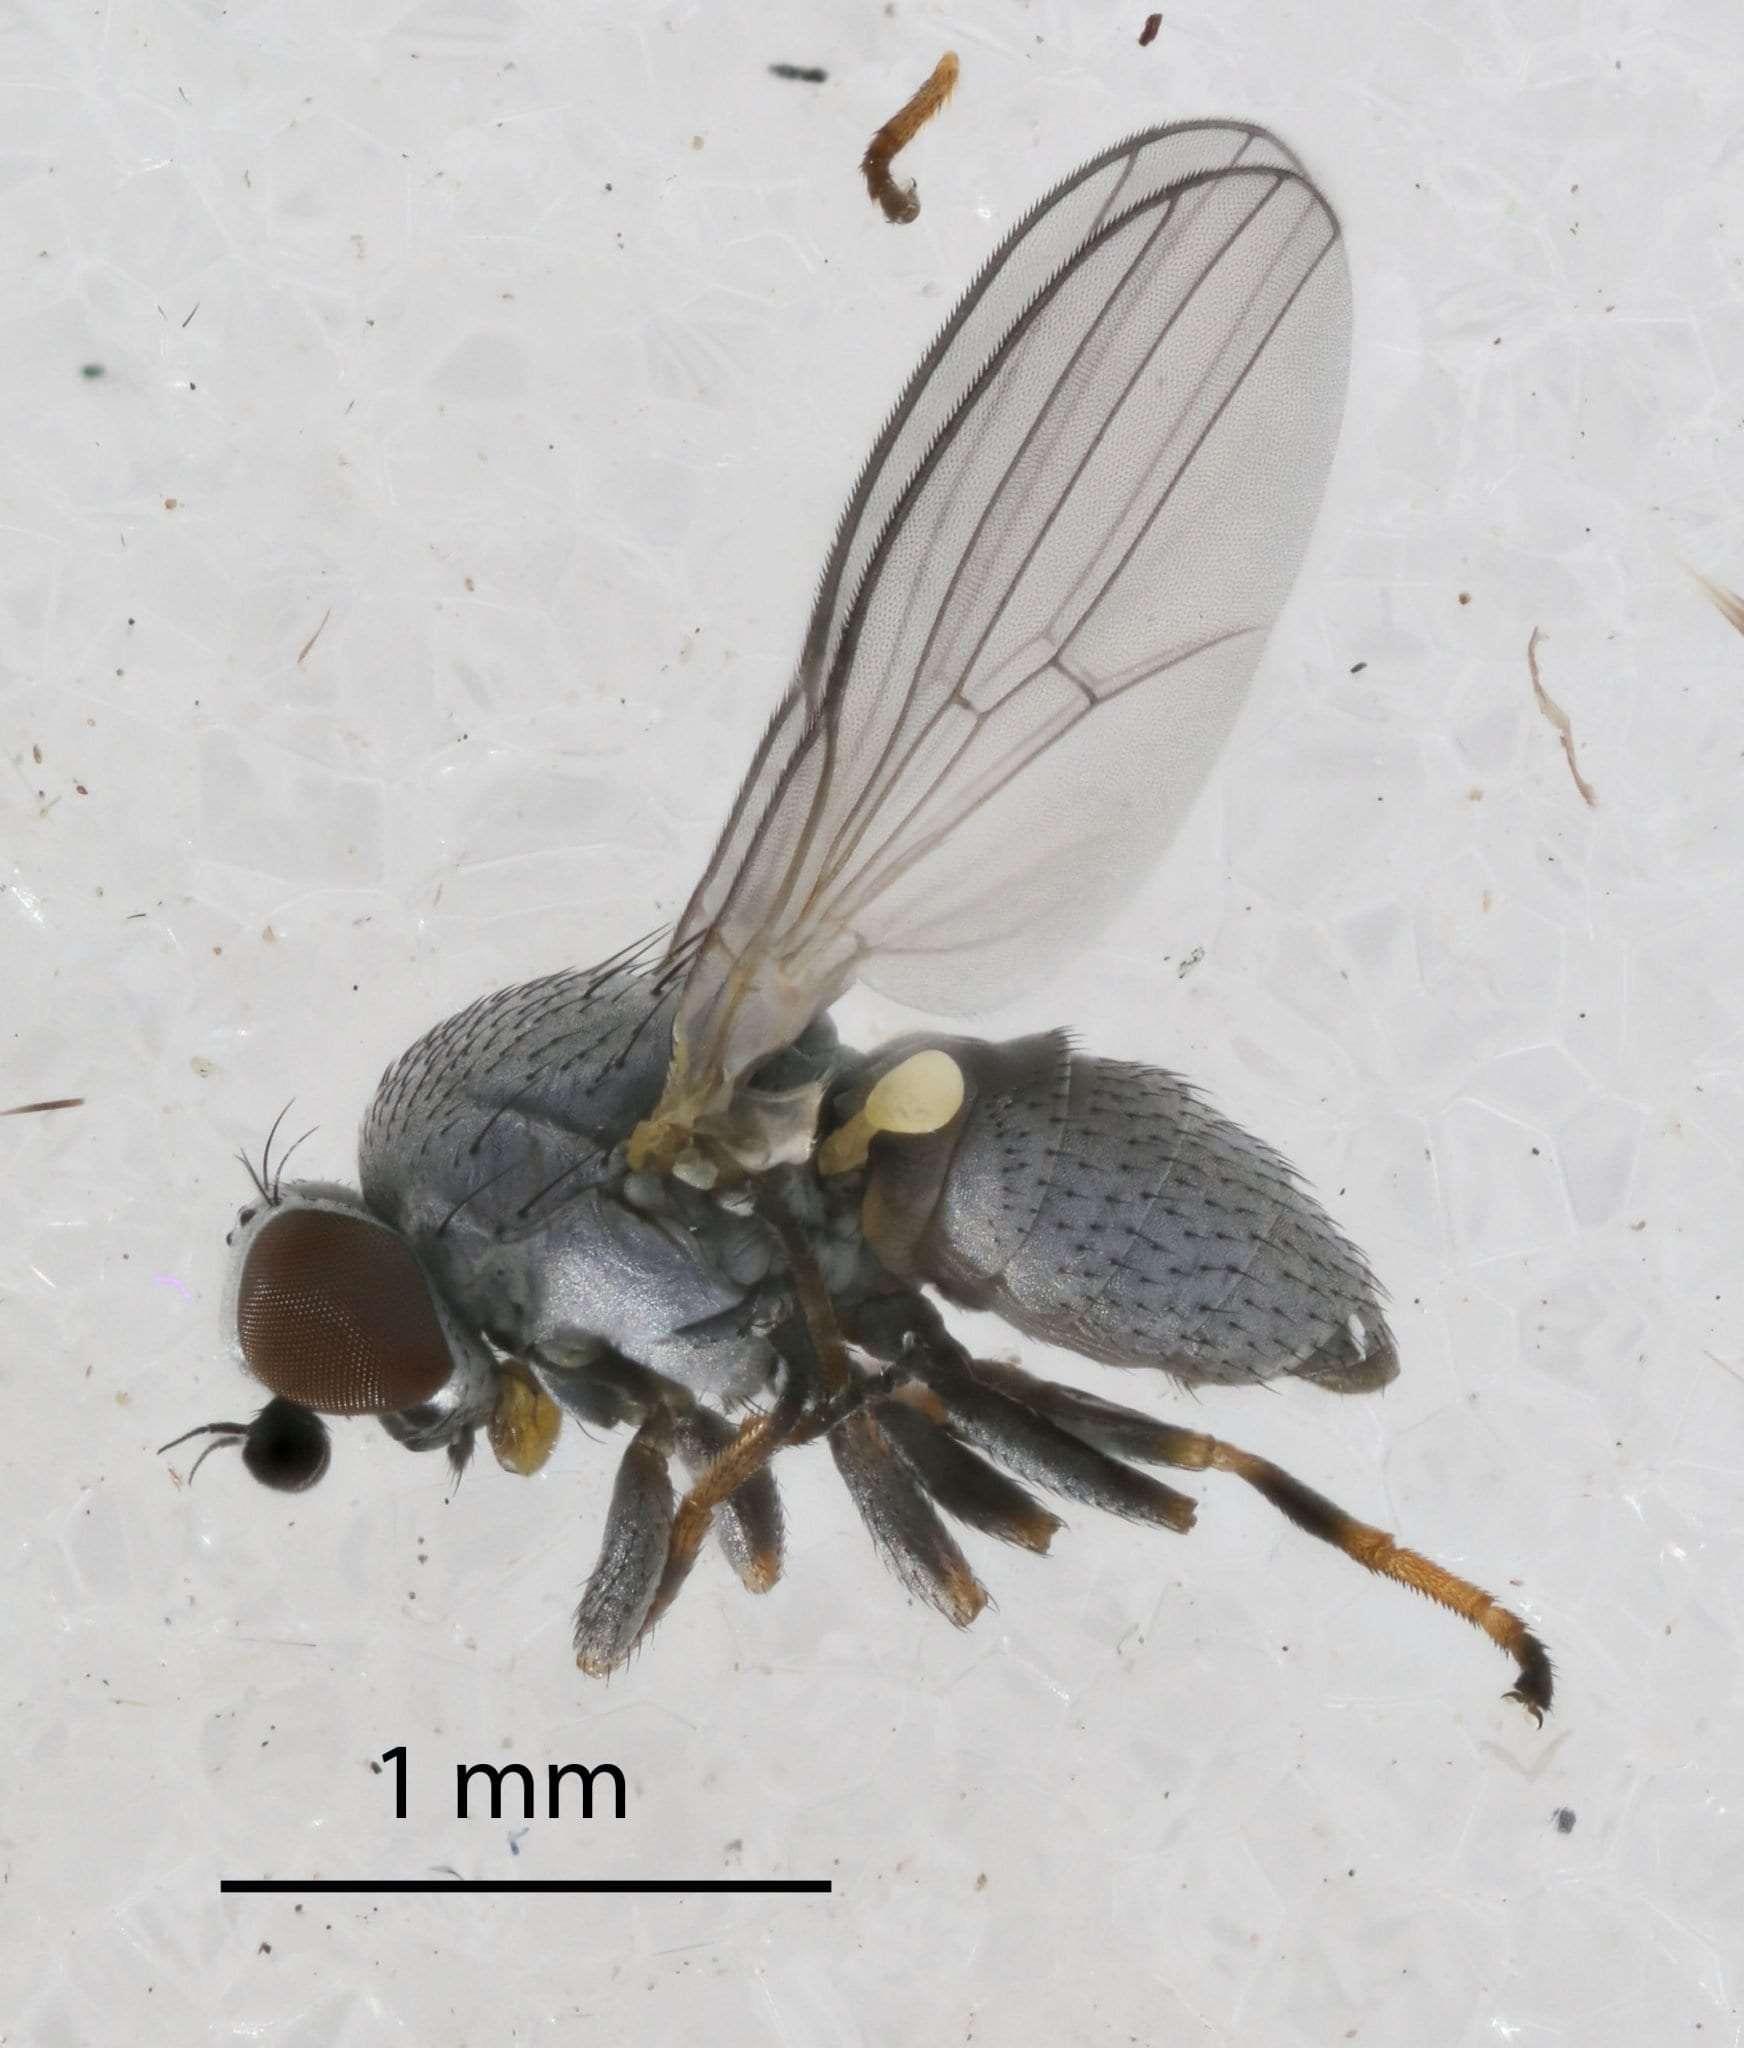 hemlock woolly adelgid eating insect